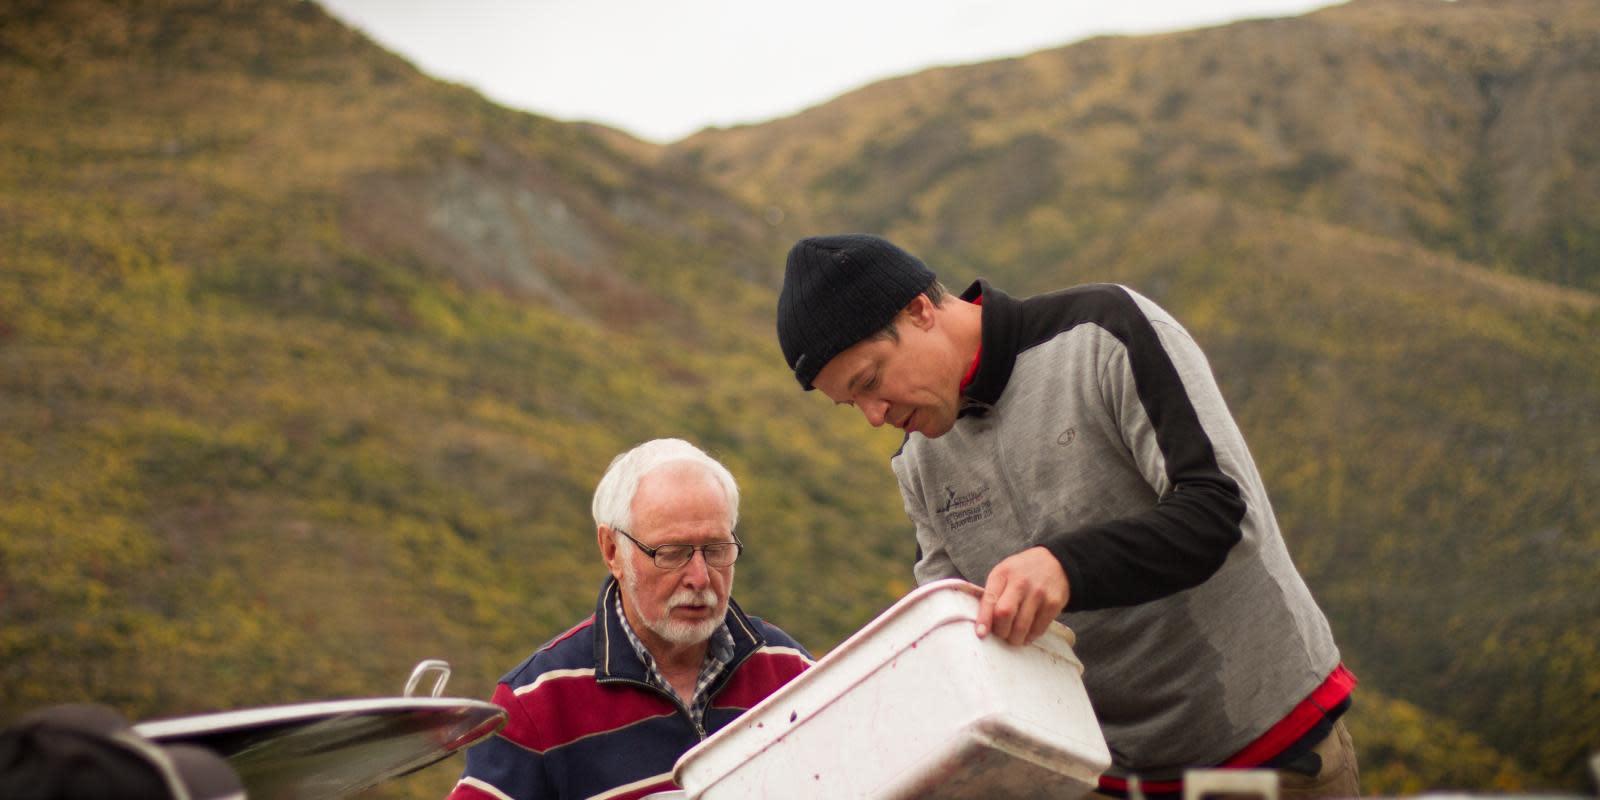 Alan Brady in Queenstown wine harvest